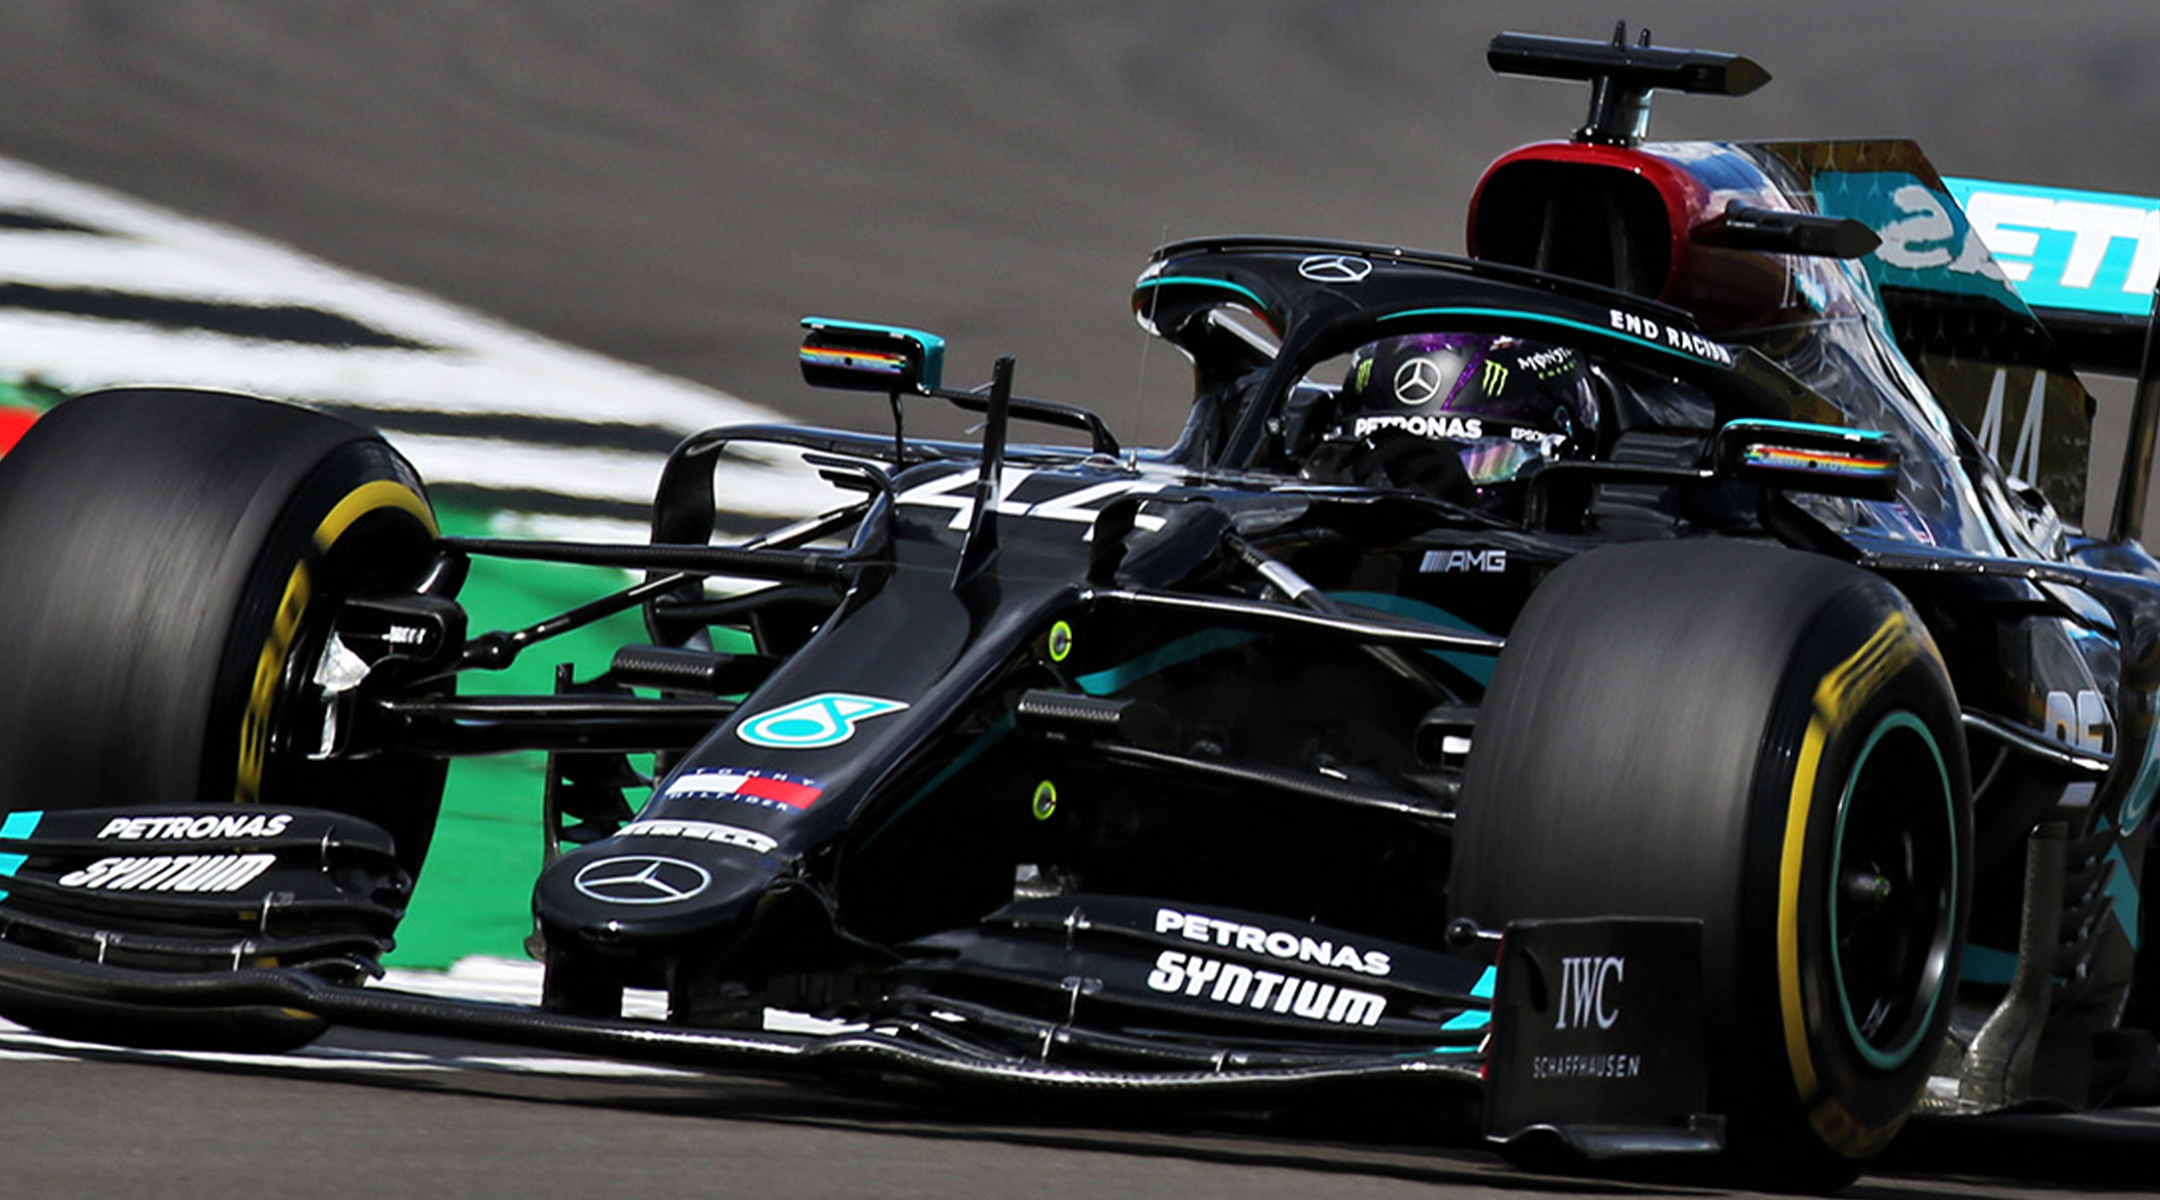 Formula 1 British Grand Prix 2021 - Silverstone - Practice